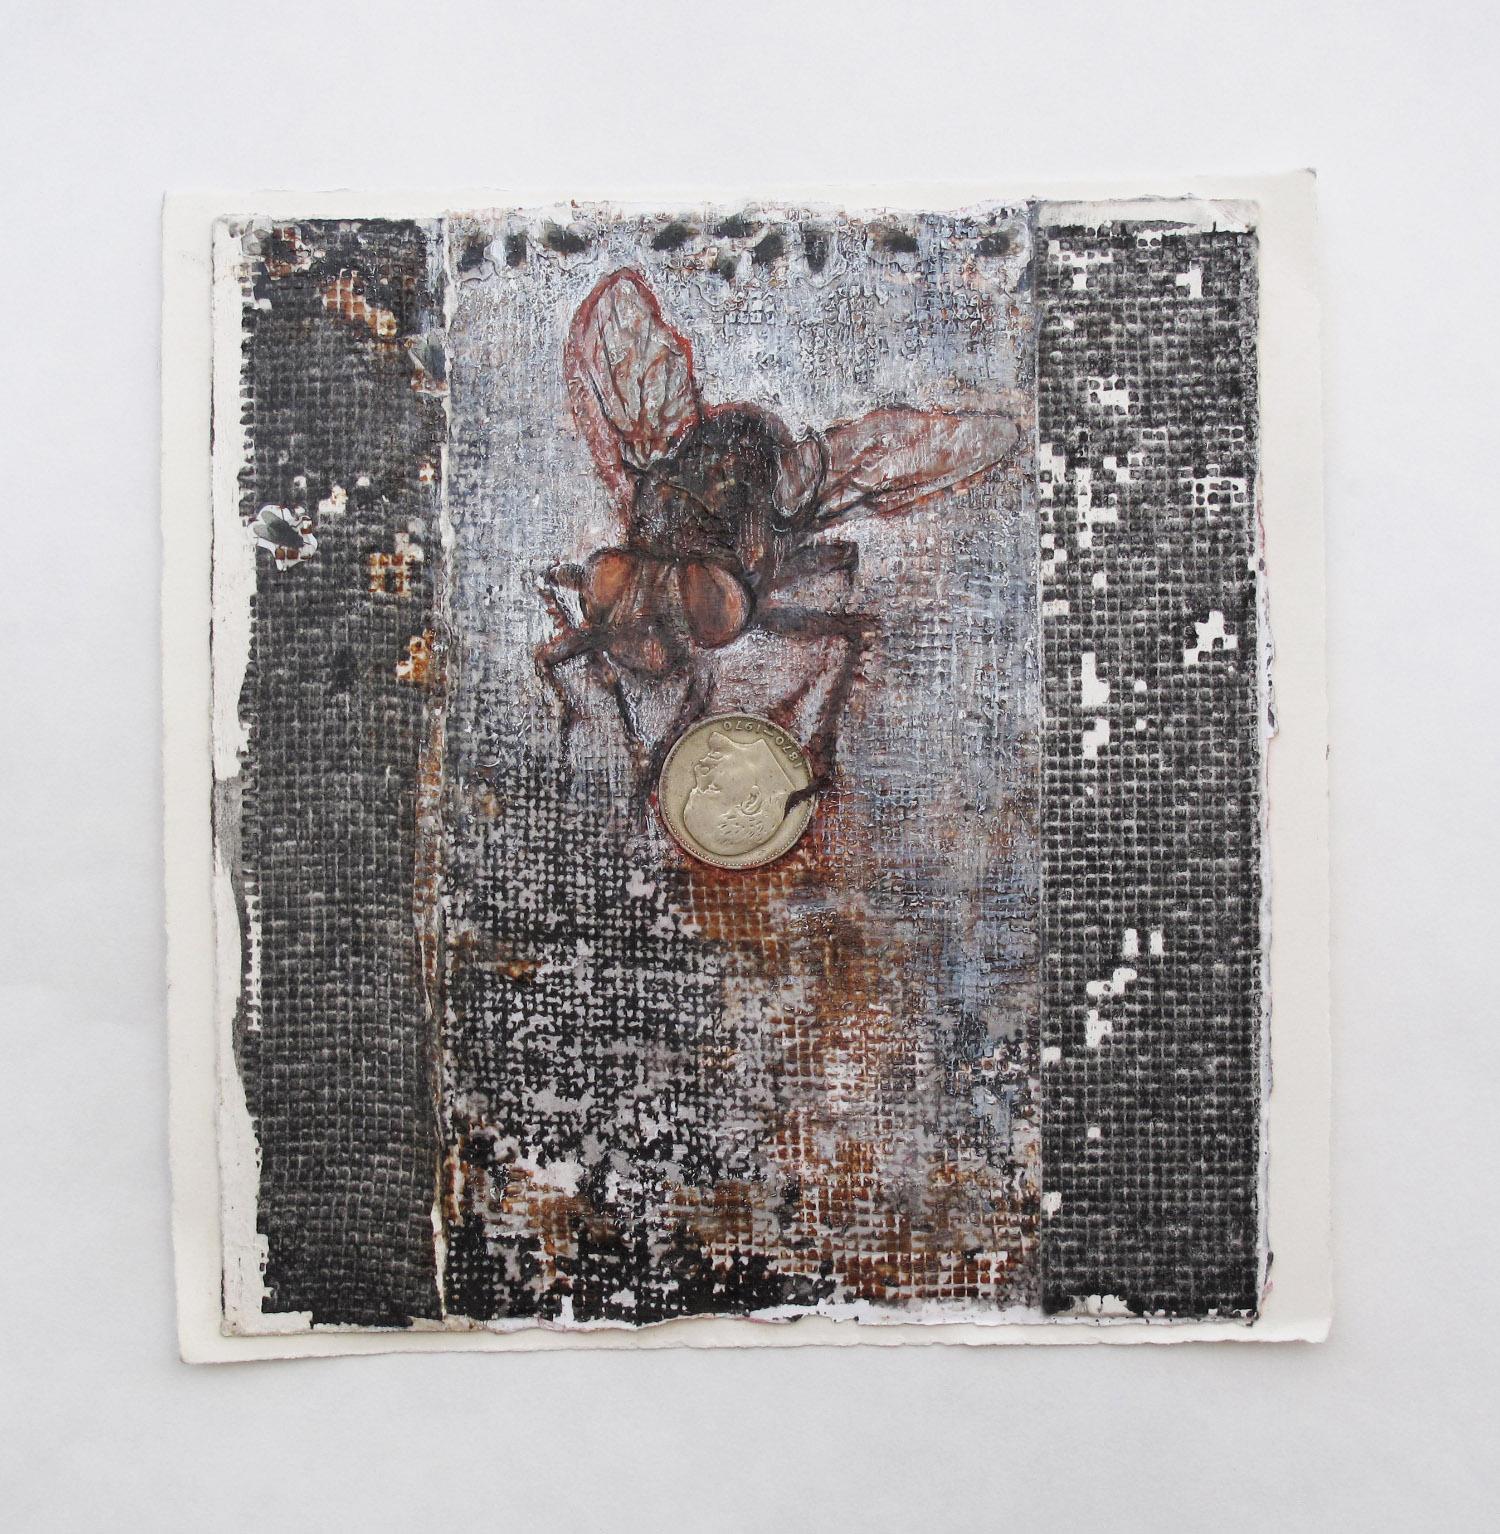 2cc(0) -Fly Eye to Eye-collage, inks, chalks, Soviet coin, paper, 9x9 in 2014.jpg